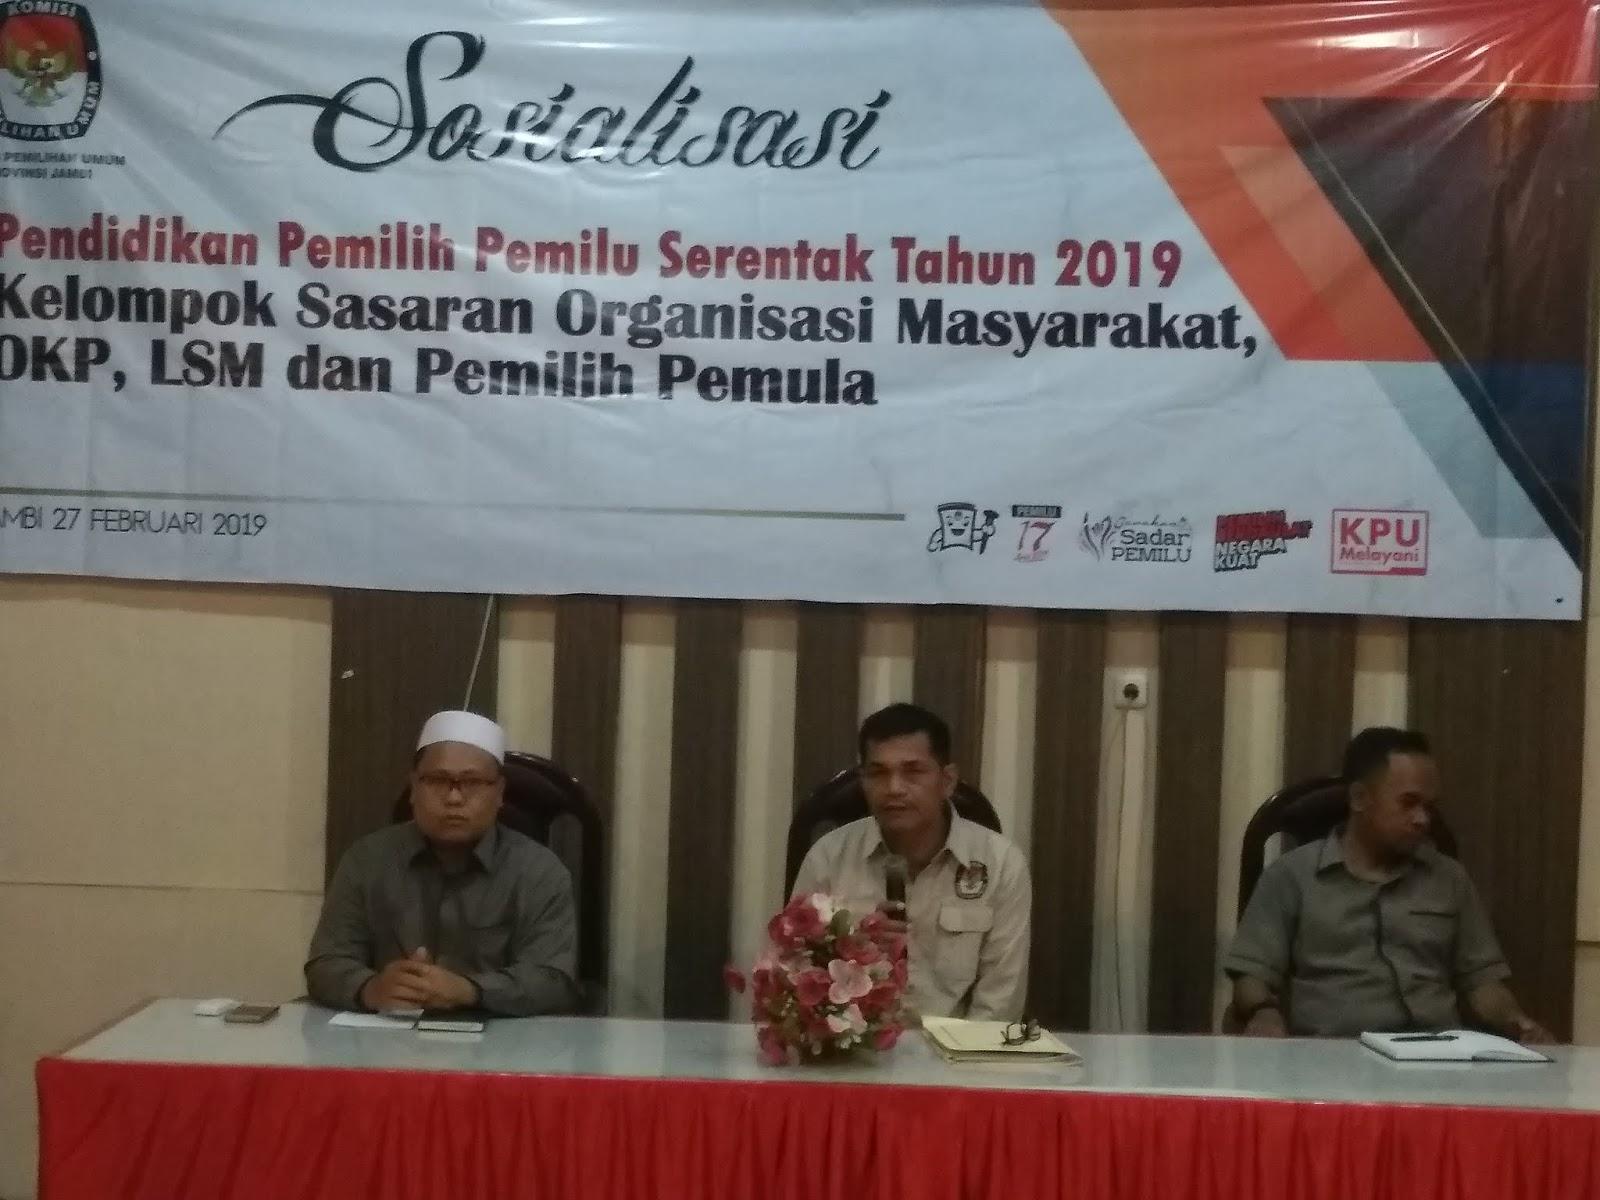 KPUD Provinsi Jambi Gelar Sosialisasi Pendidikan Pemilih Pemilu Serentak Bagi Ormas, OKP, LSM Dan Pemilih Pemula.